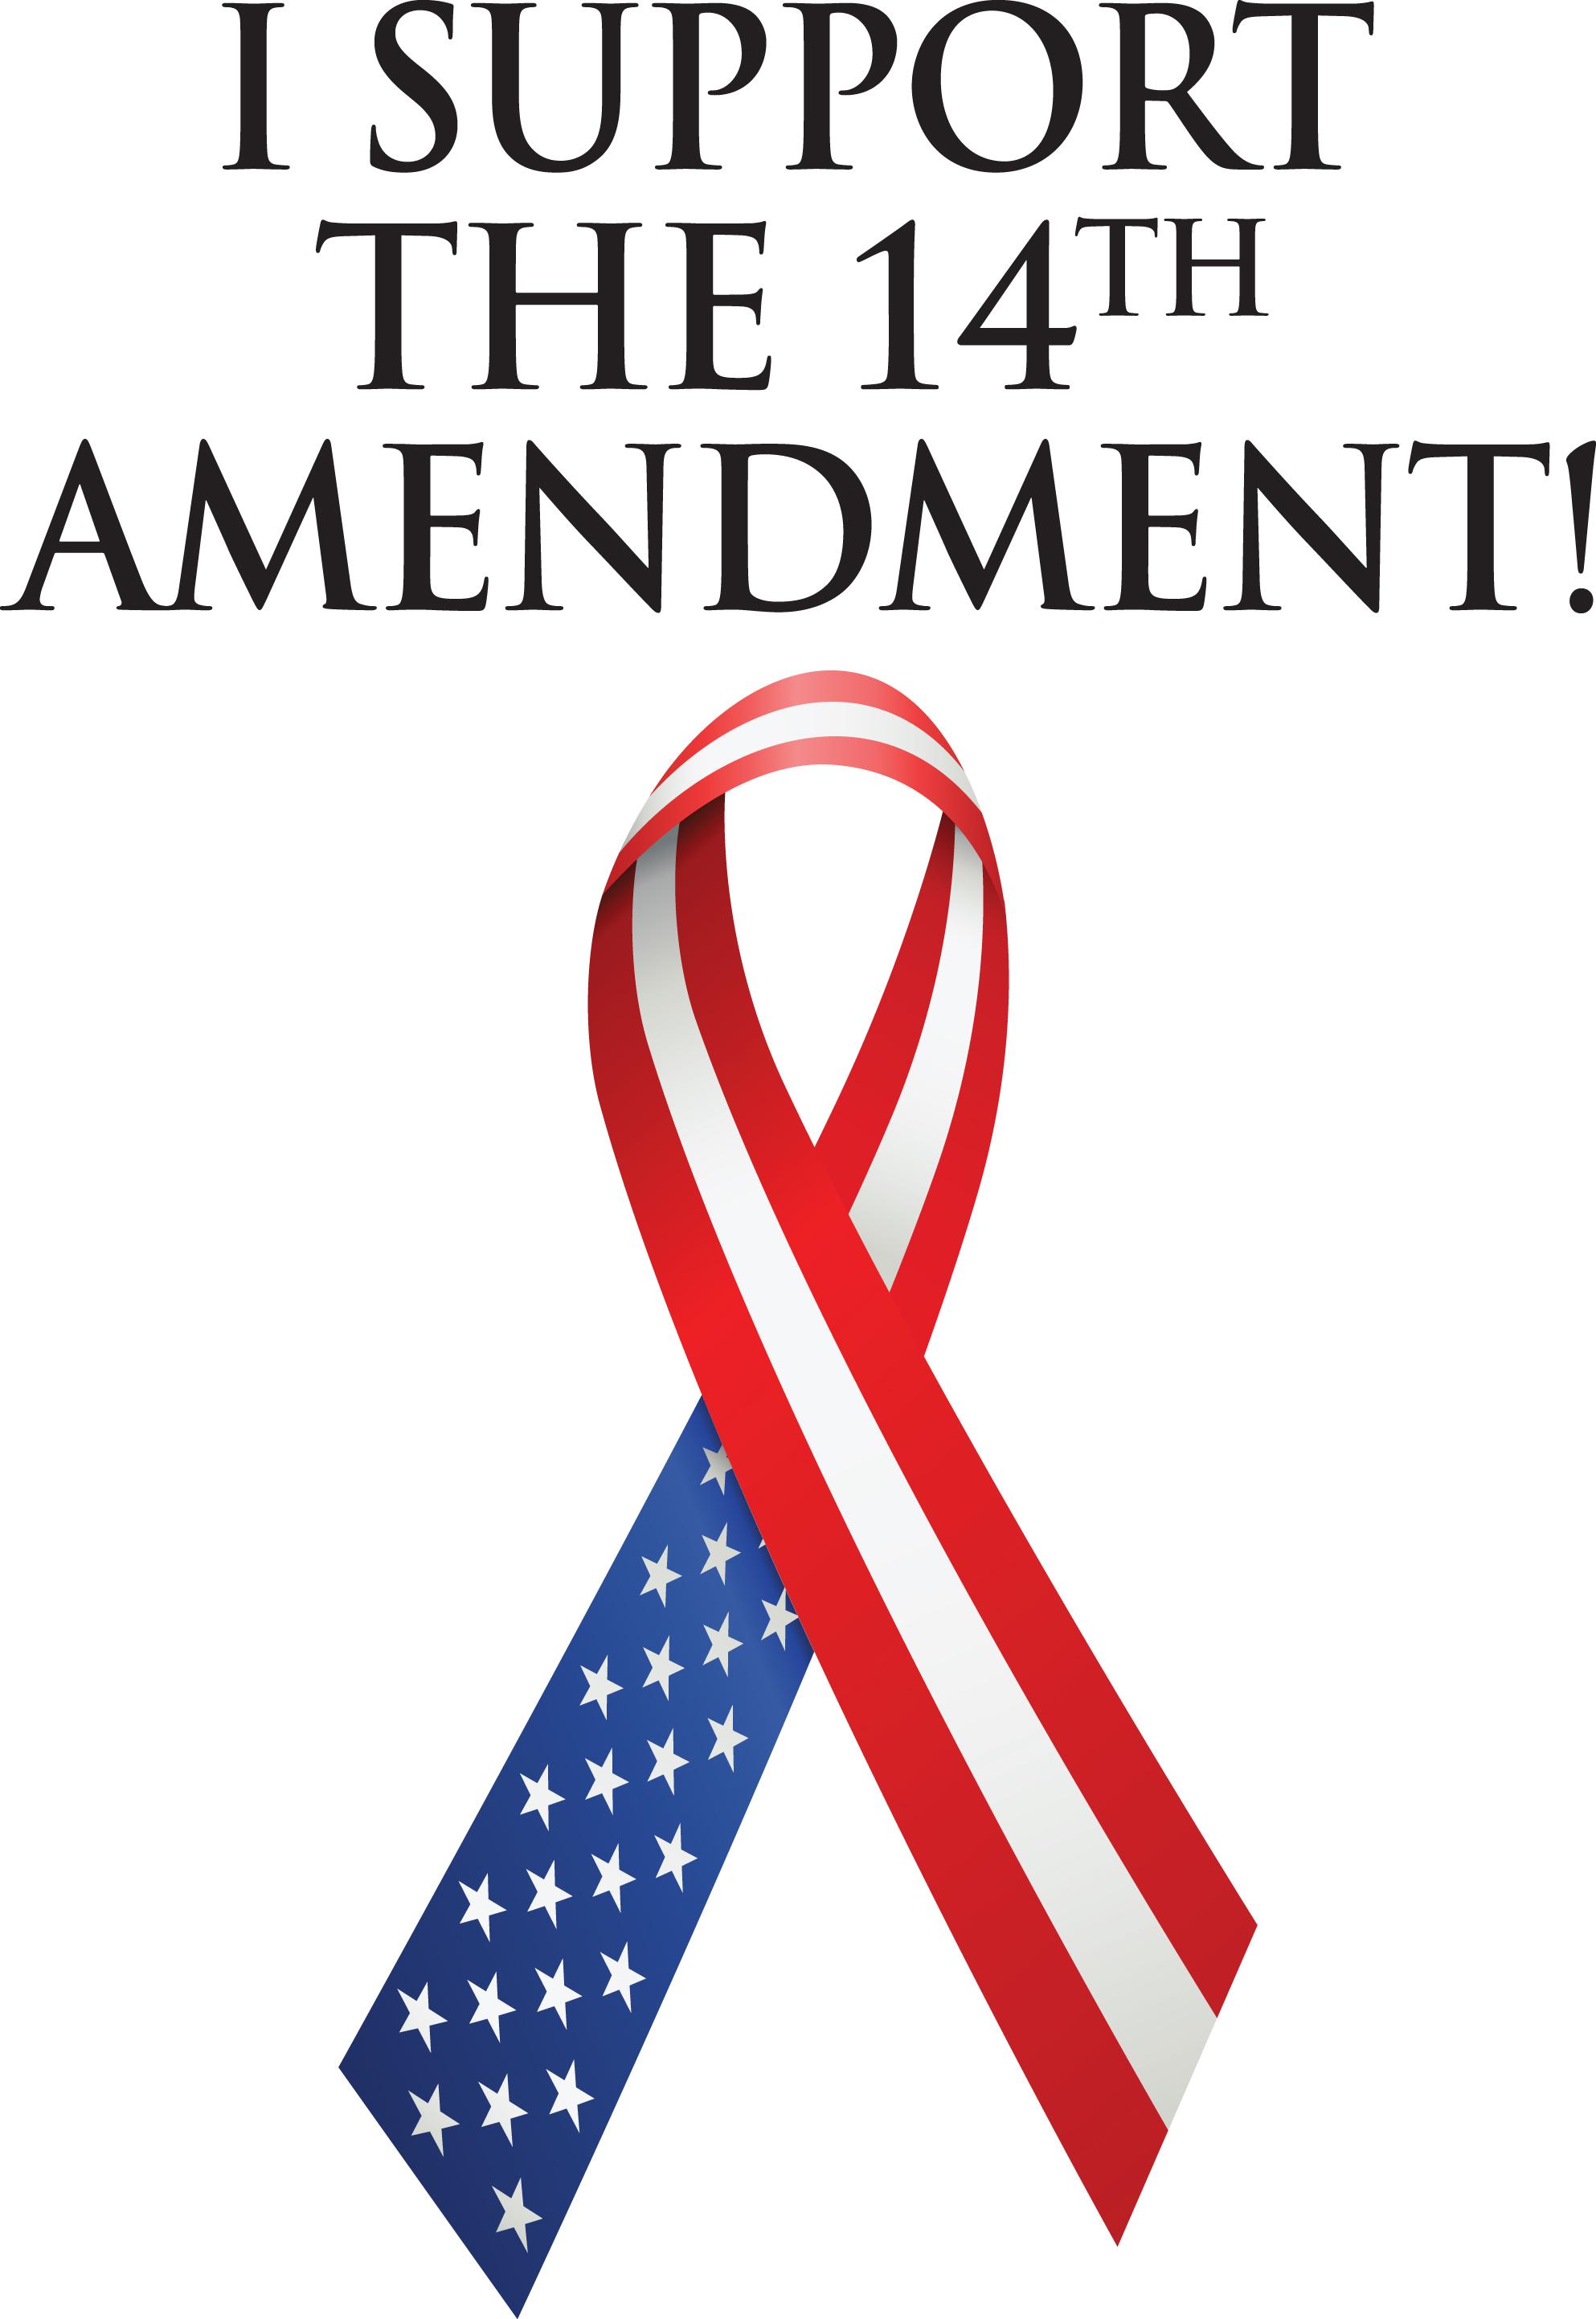 Support the 14th Amendment.